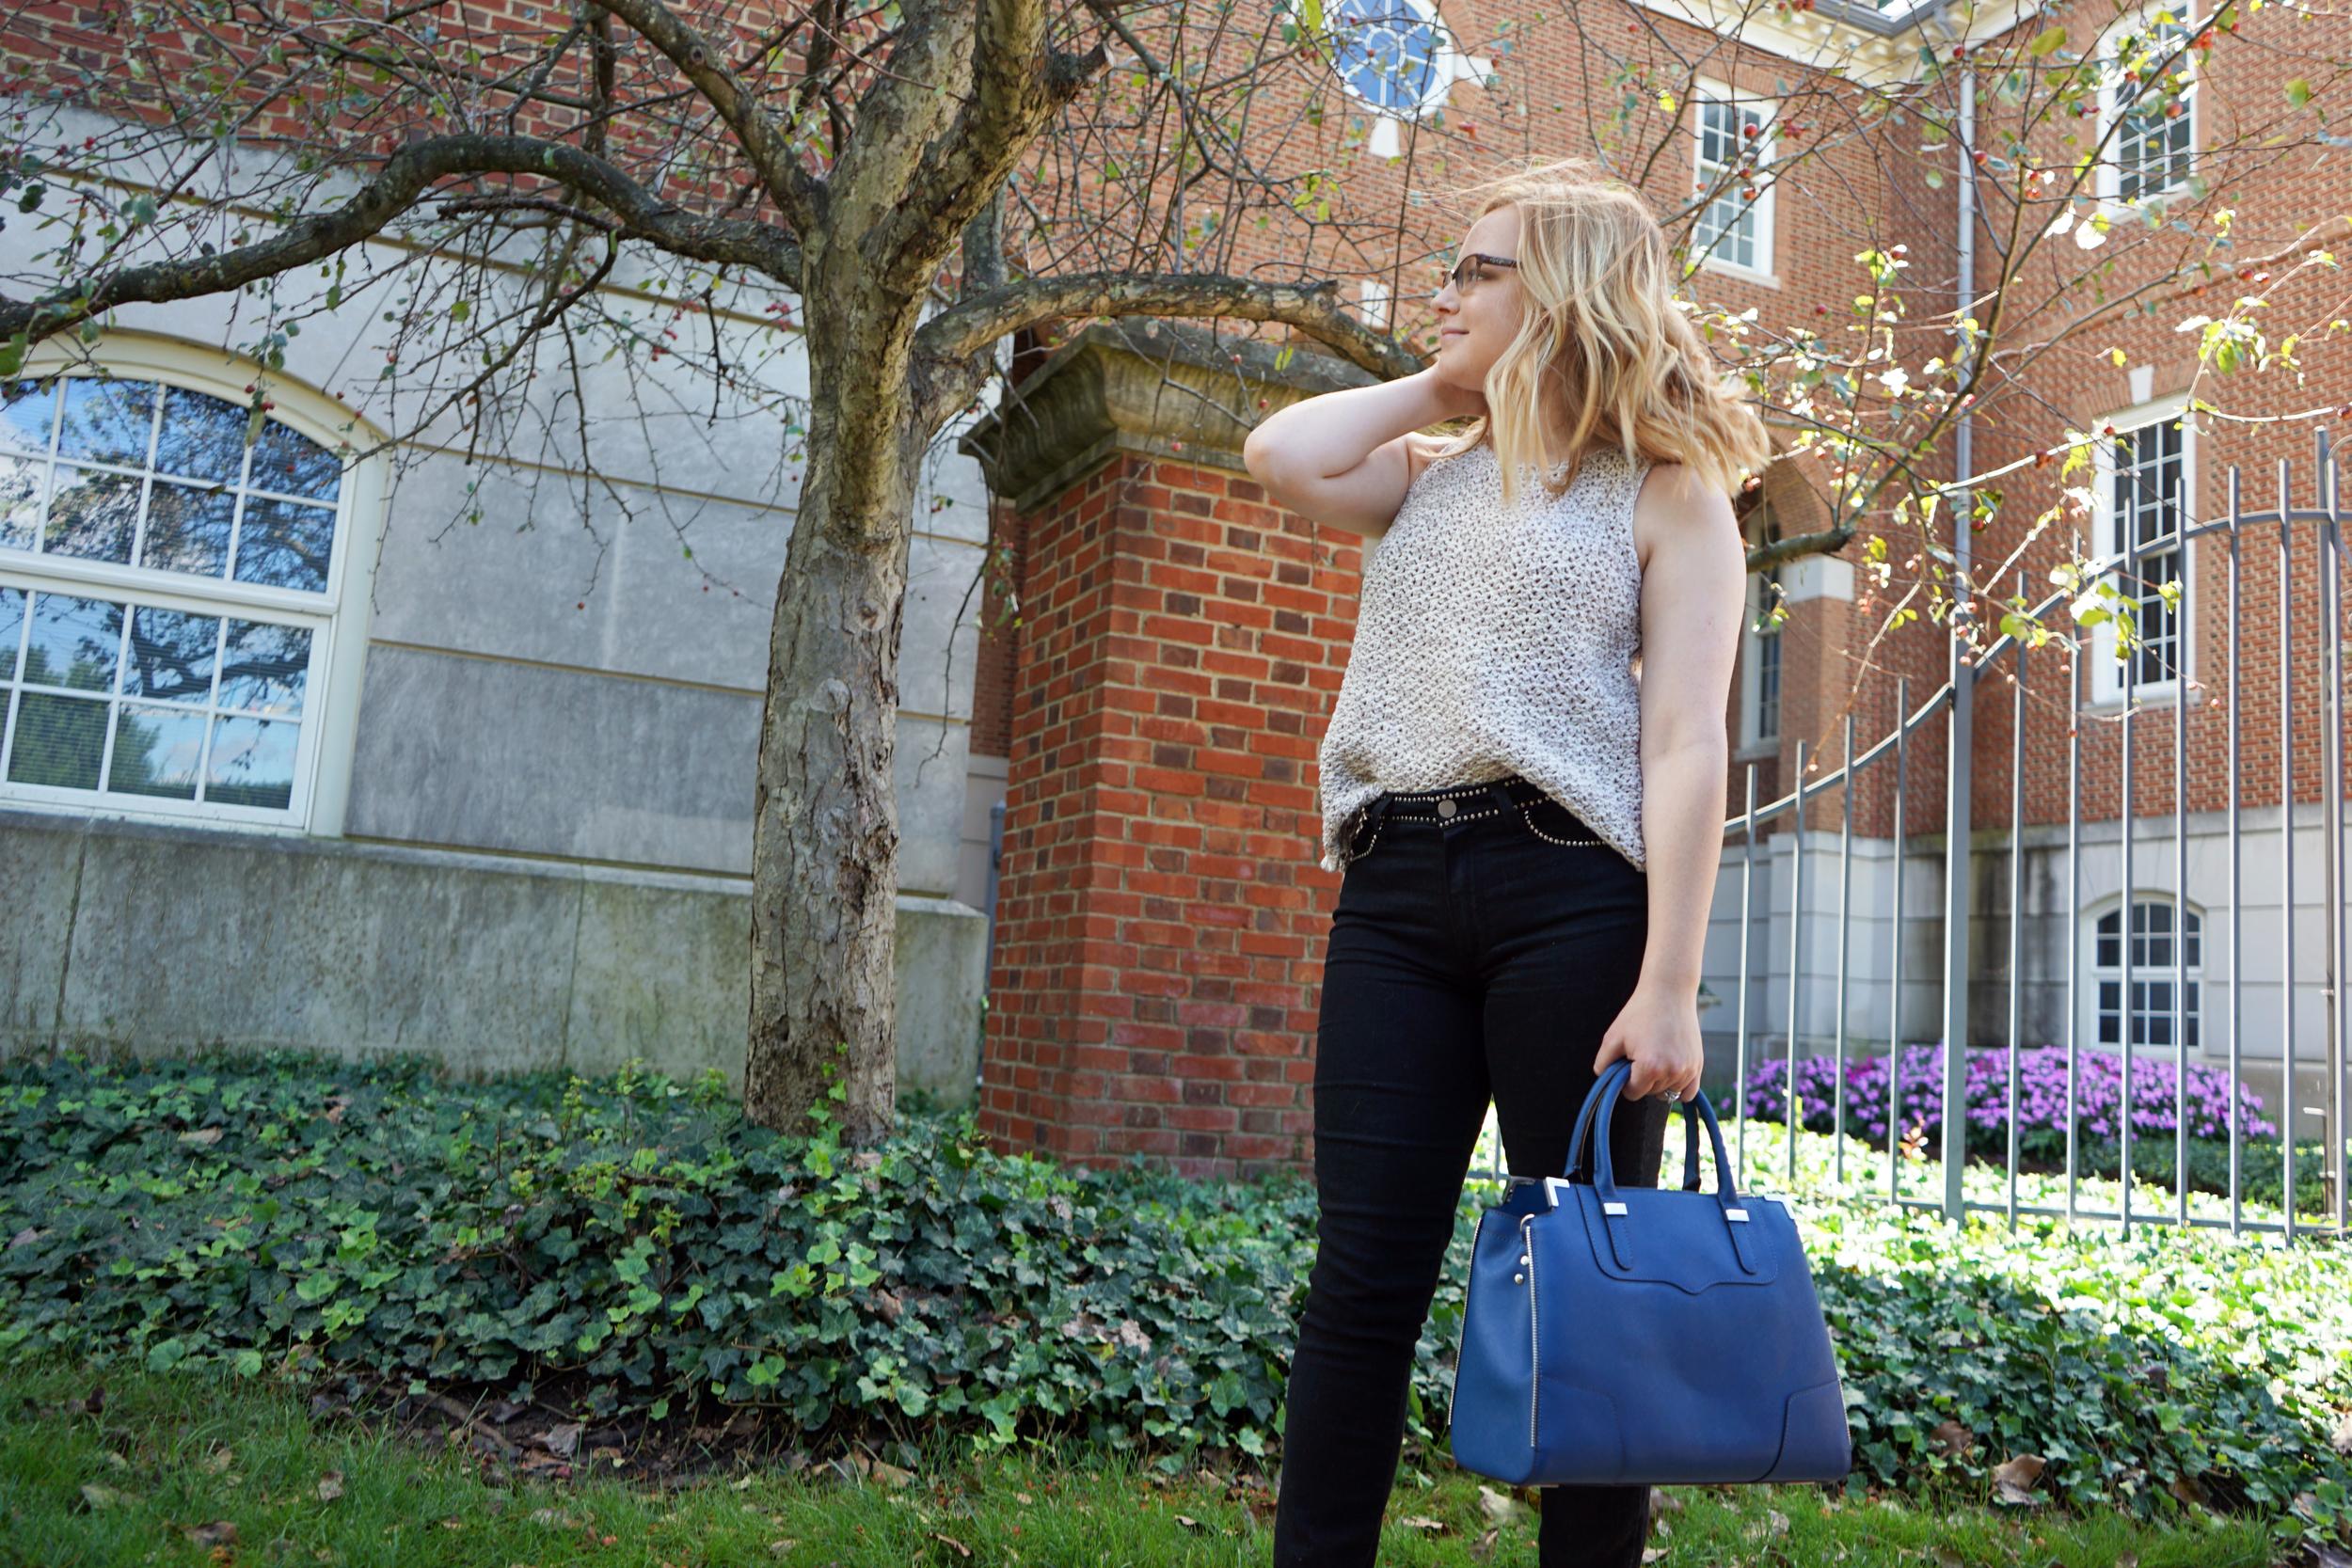 Paige Hoxton Imperial Noir studded jeans, LOFT crochet tank, Rebecca Minkoff amorous satchel, Steve Madden Carrson sandals heels - Maggie a la Mode Studded Jeans